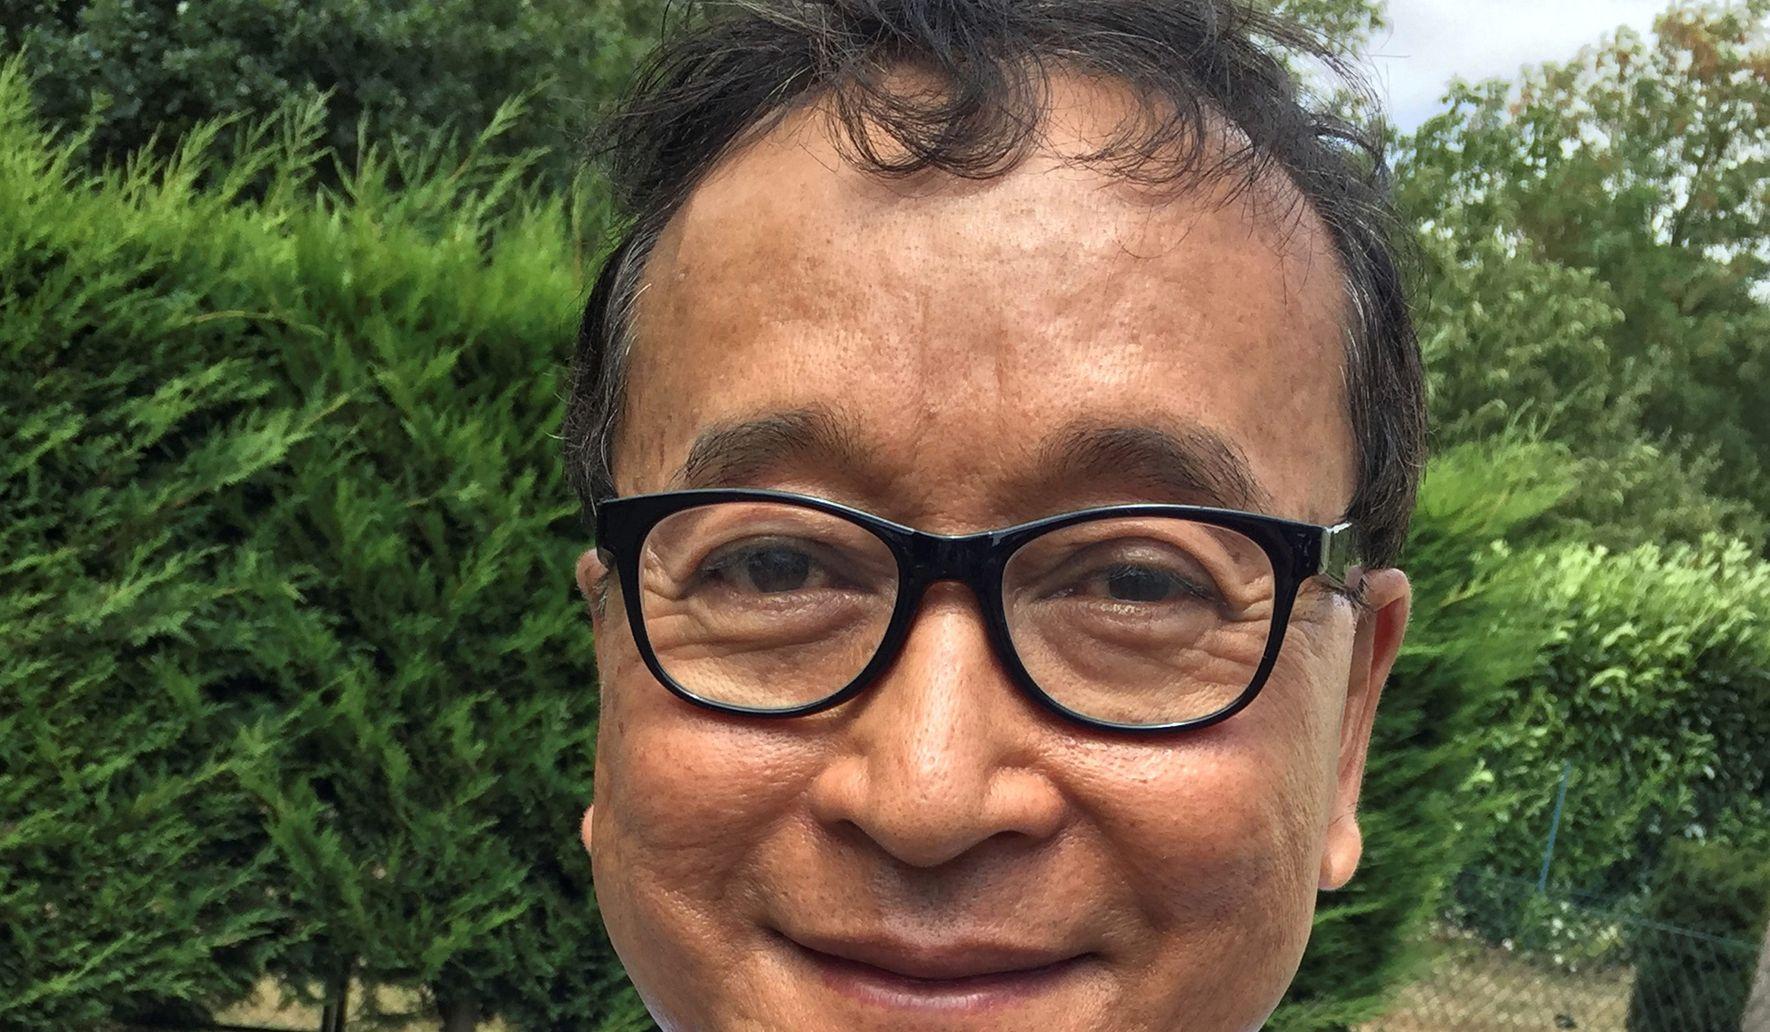 Rainsy's vow to return to Cambodia reignites rivalry with Hun Sen